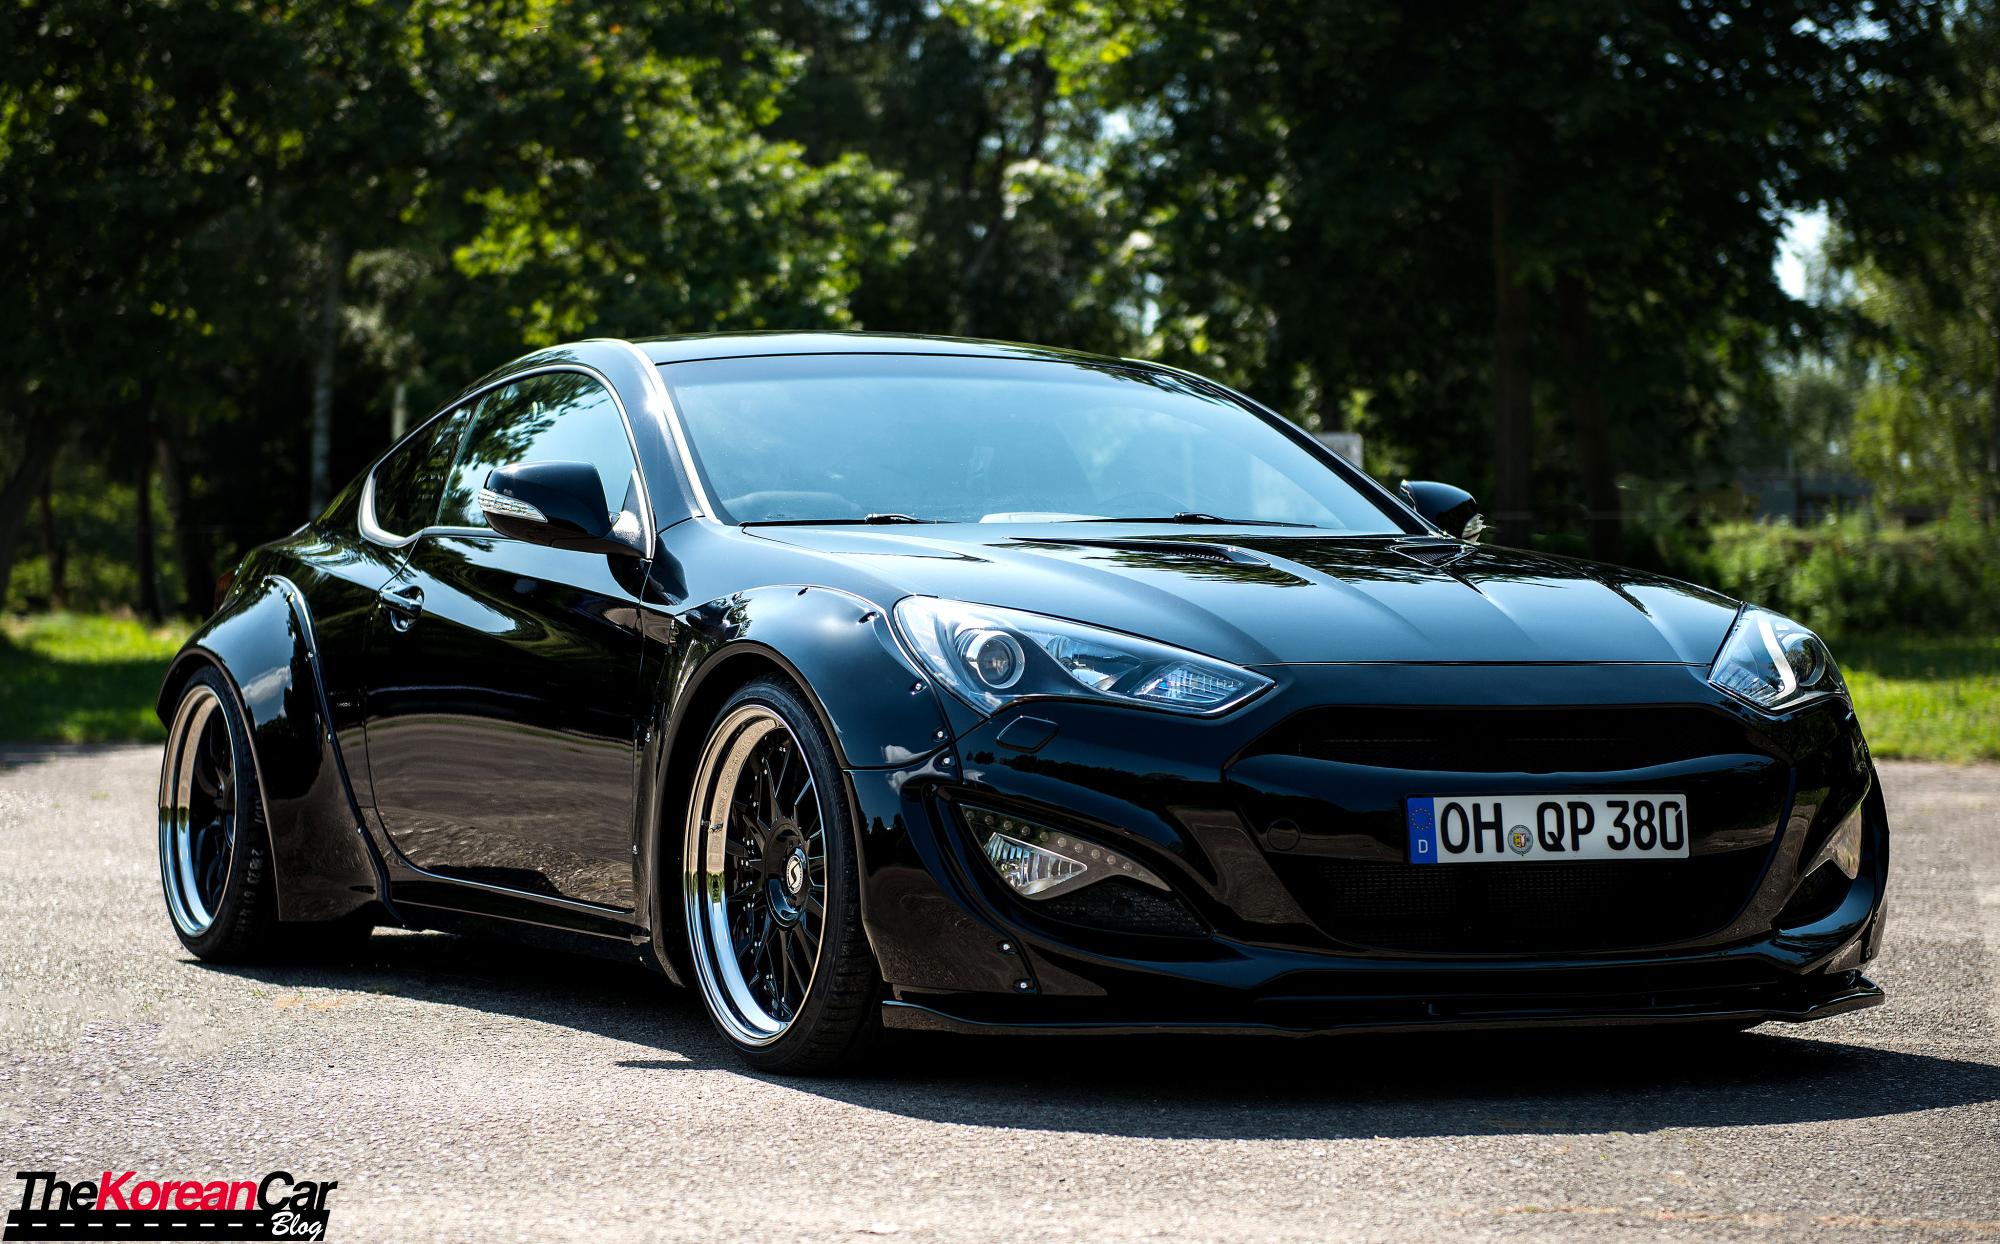 Interview Nils Weinberg 2013 Hyundai Genesis Coupe 3 8